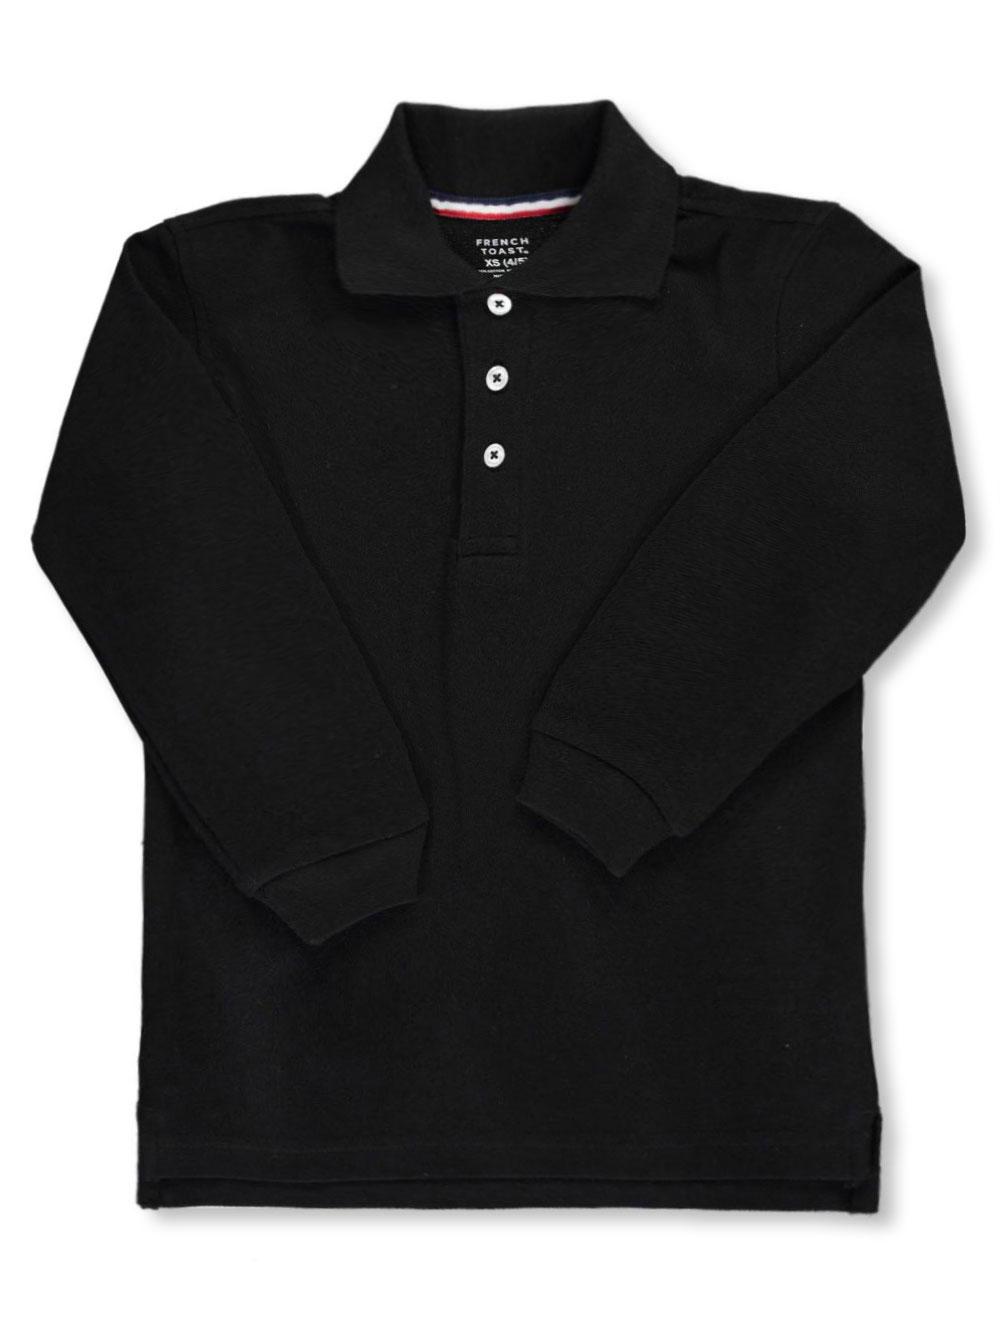 French Toast School Uniform Unisex L/S Pique Polo (Sizes 4 - 7) - black, 4 - 5